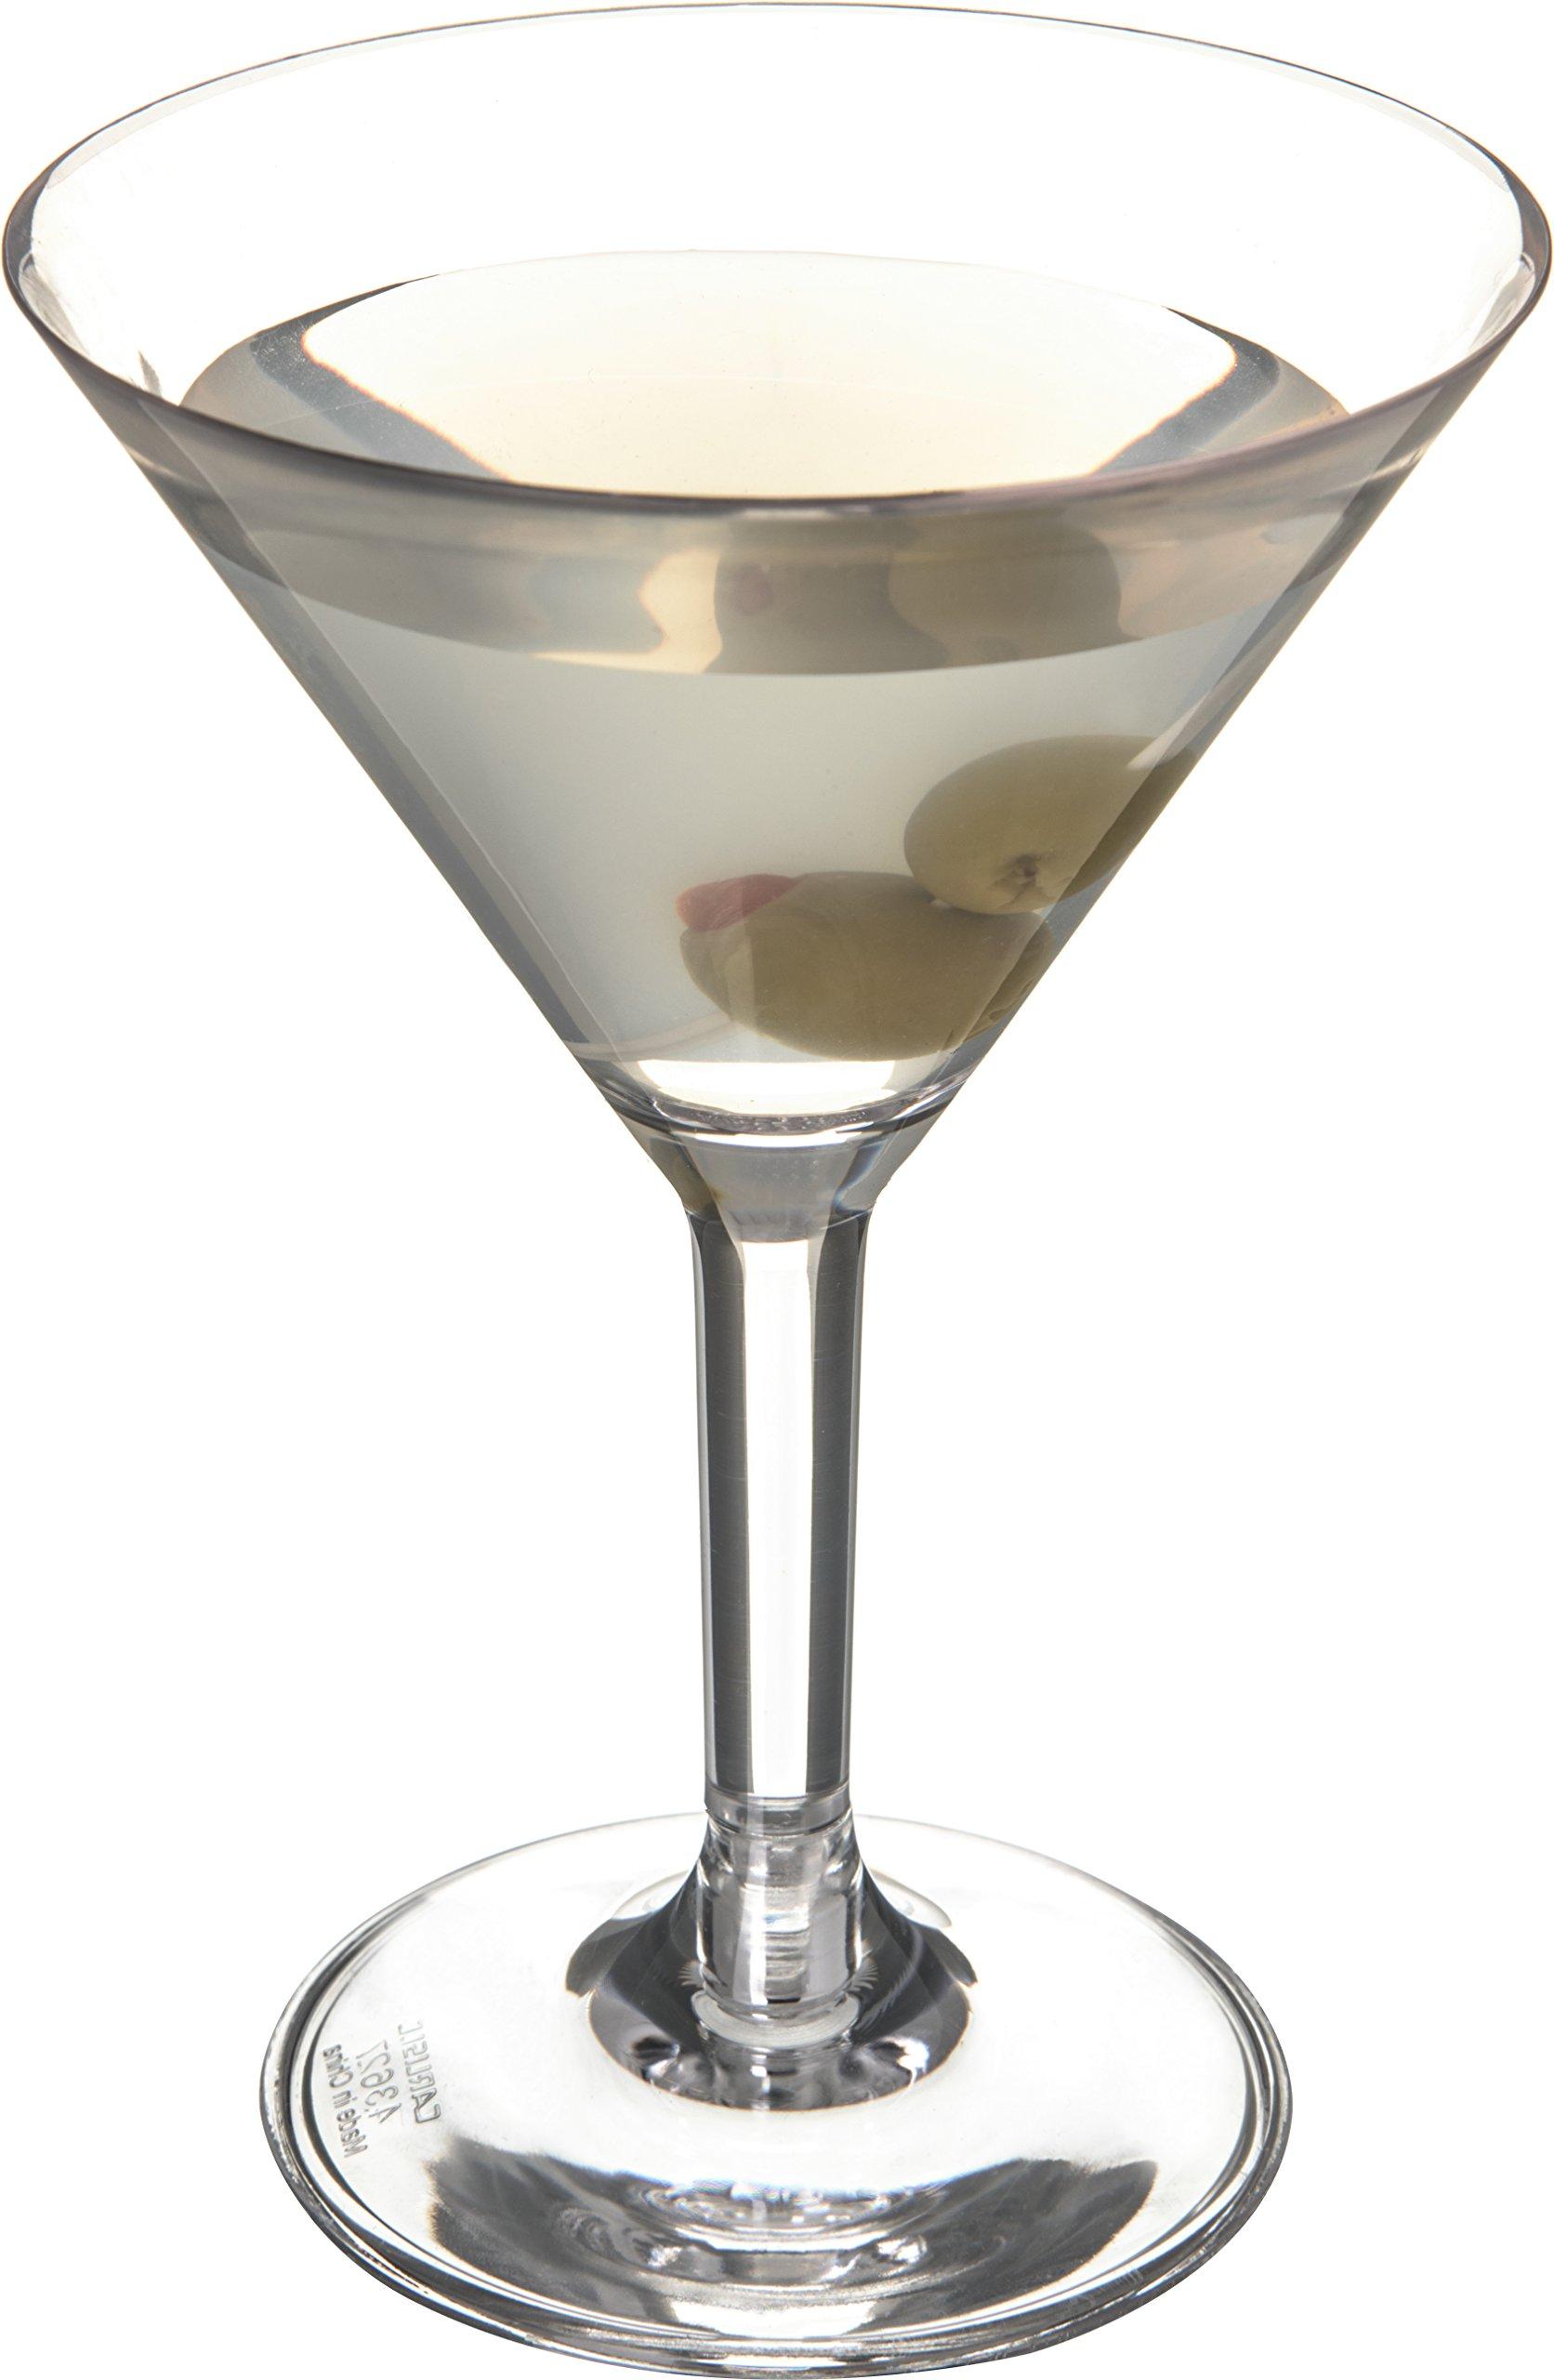 Carlisle 4362707 Liberty Polycarbonate Martini Glass, 8-oz. Capacity, Clear (Case of 24) by Carlisle (Image #2)